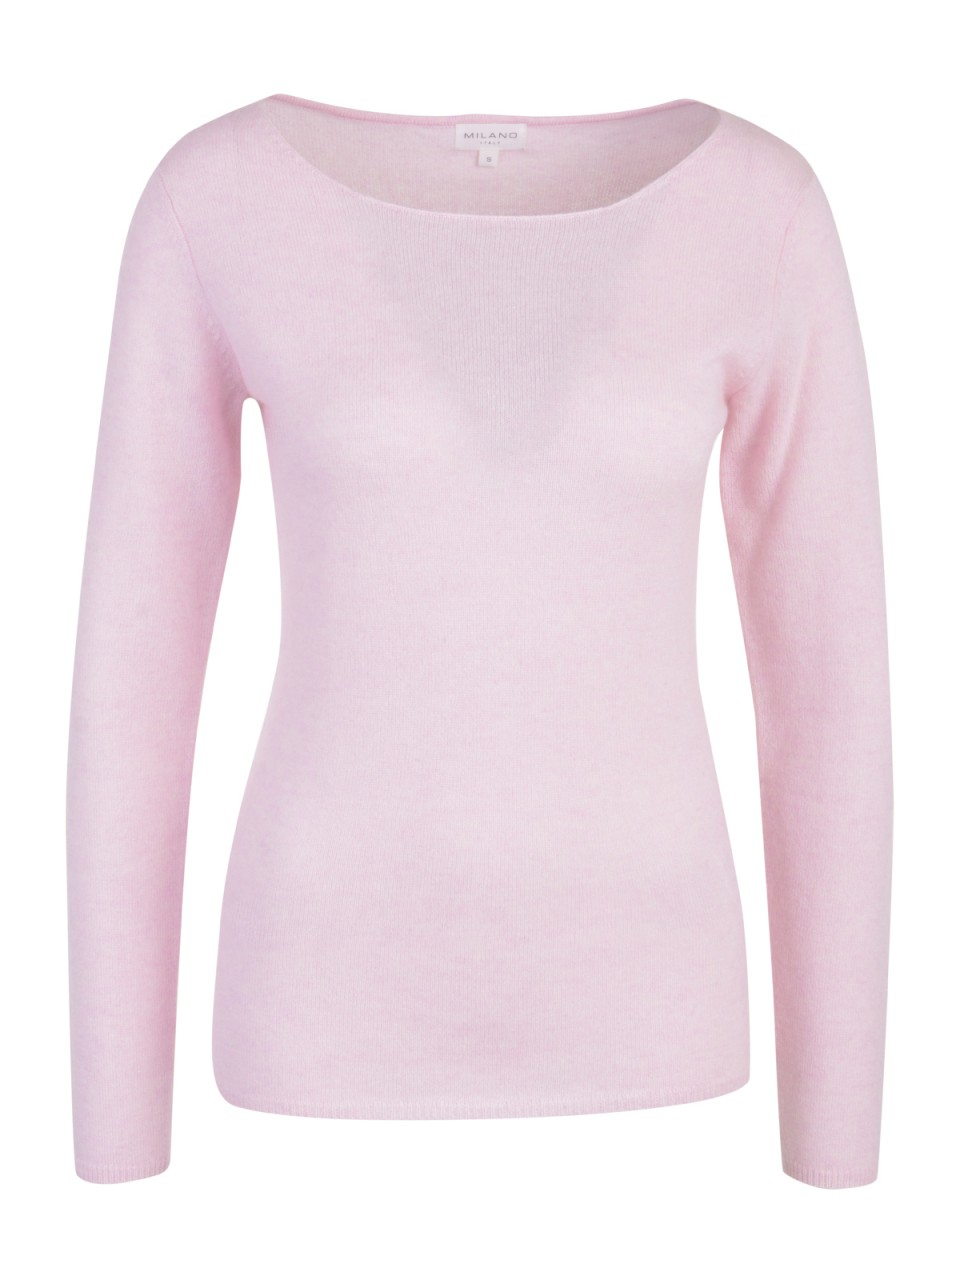 milano-italy-damen-kaschmir-pullover-pink